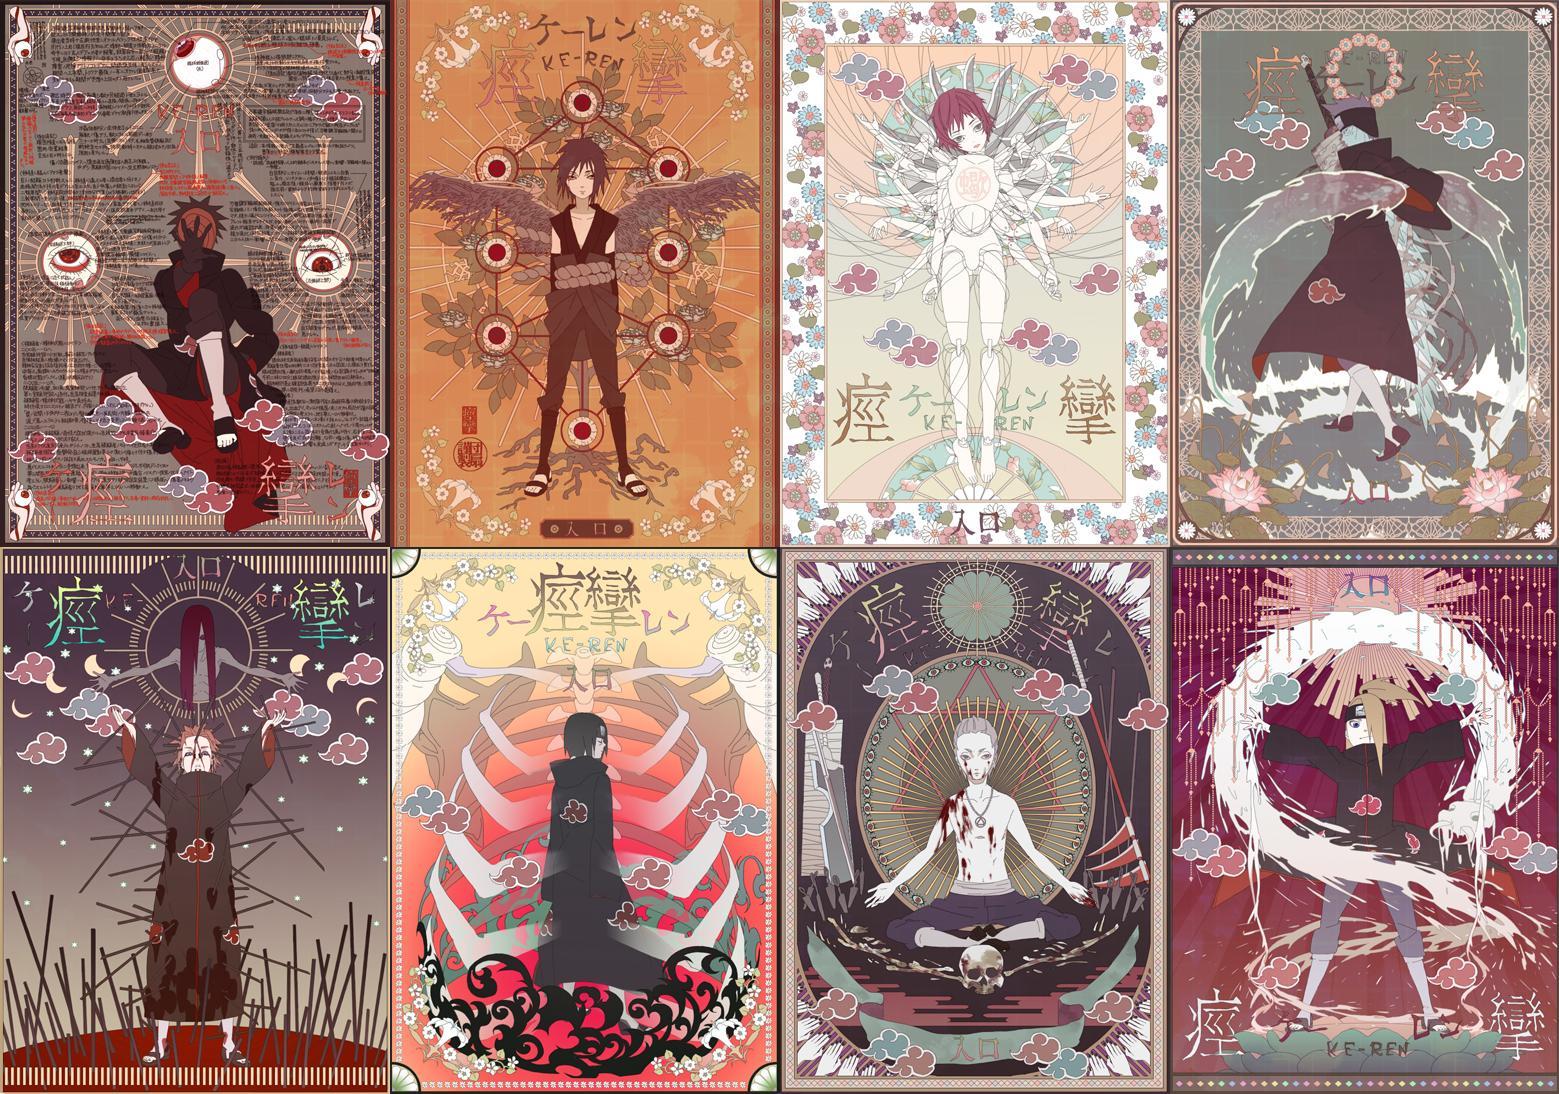 59 Akatsuki Naruto Hd Wallpapers Background Images Wallpaper Abyss